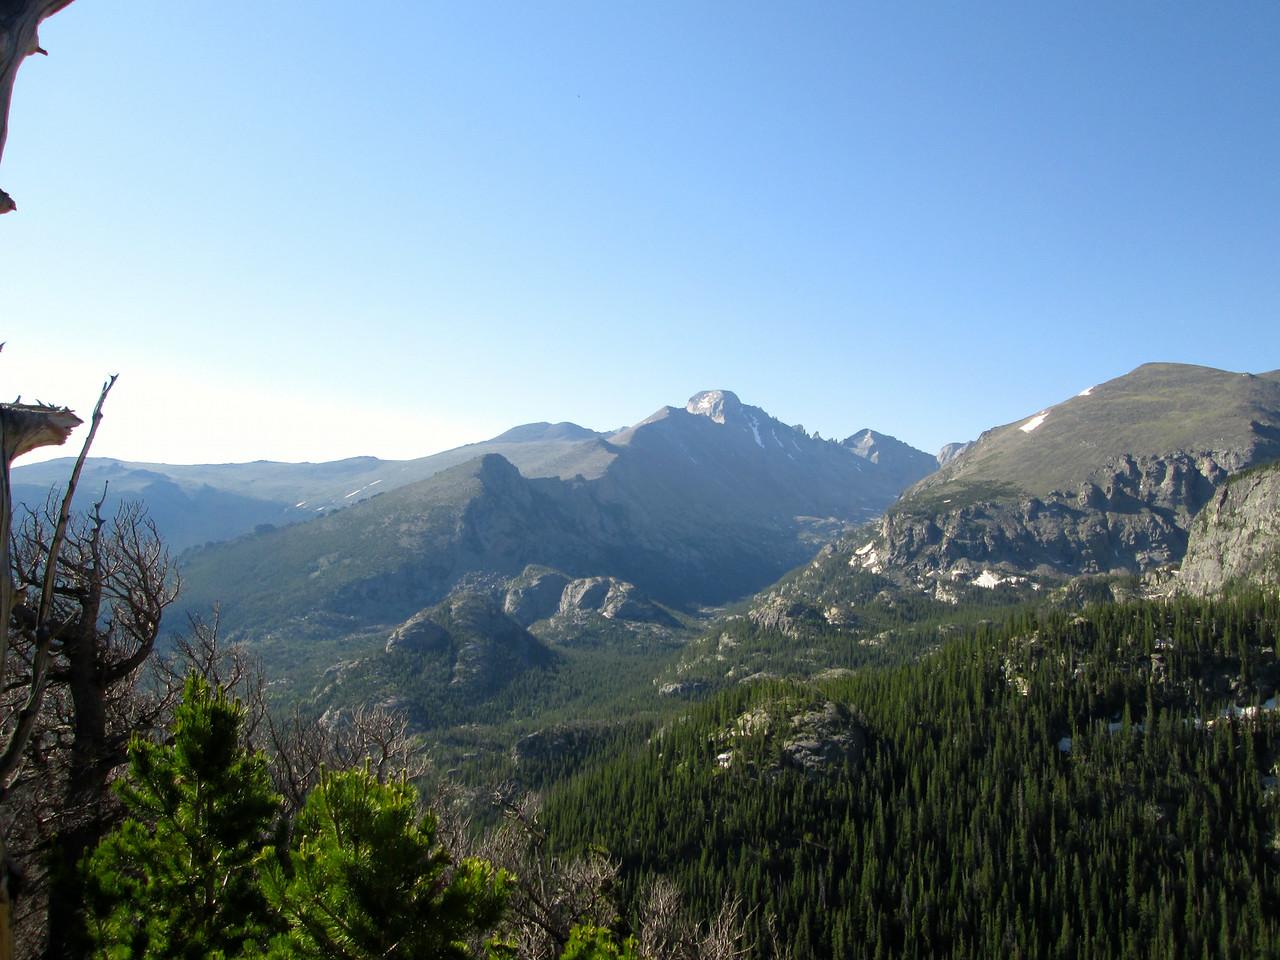 Long's Peak in Center Background